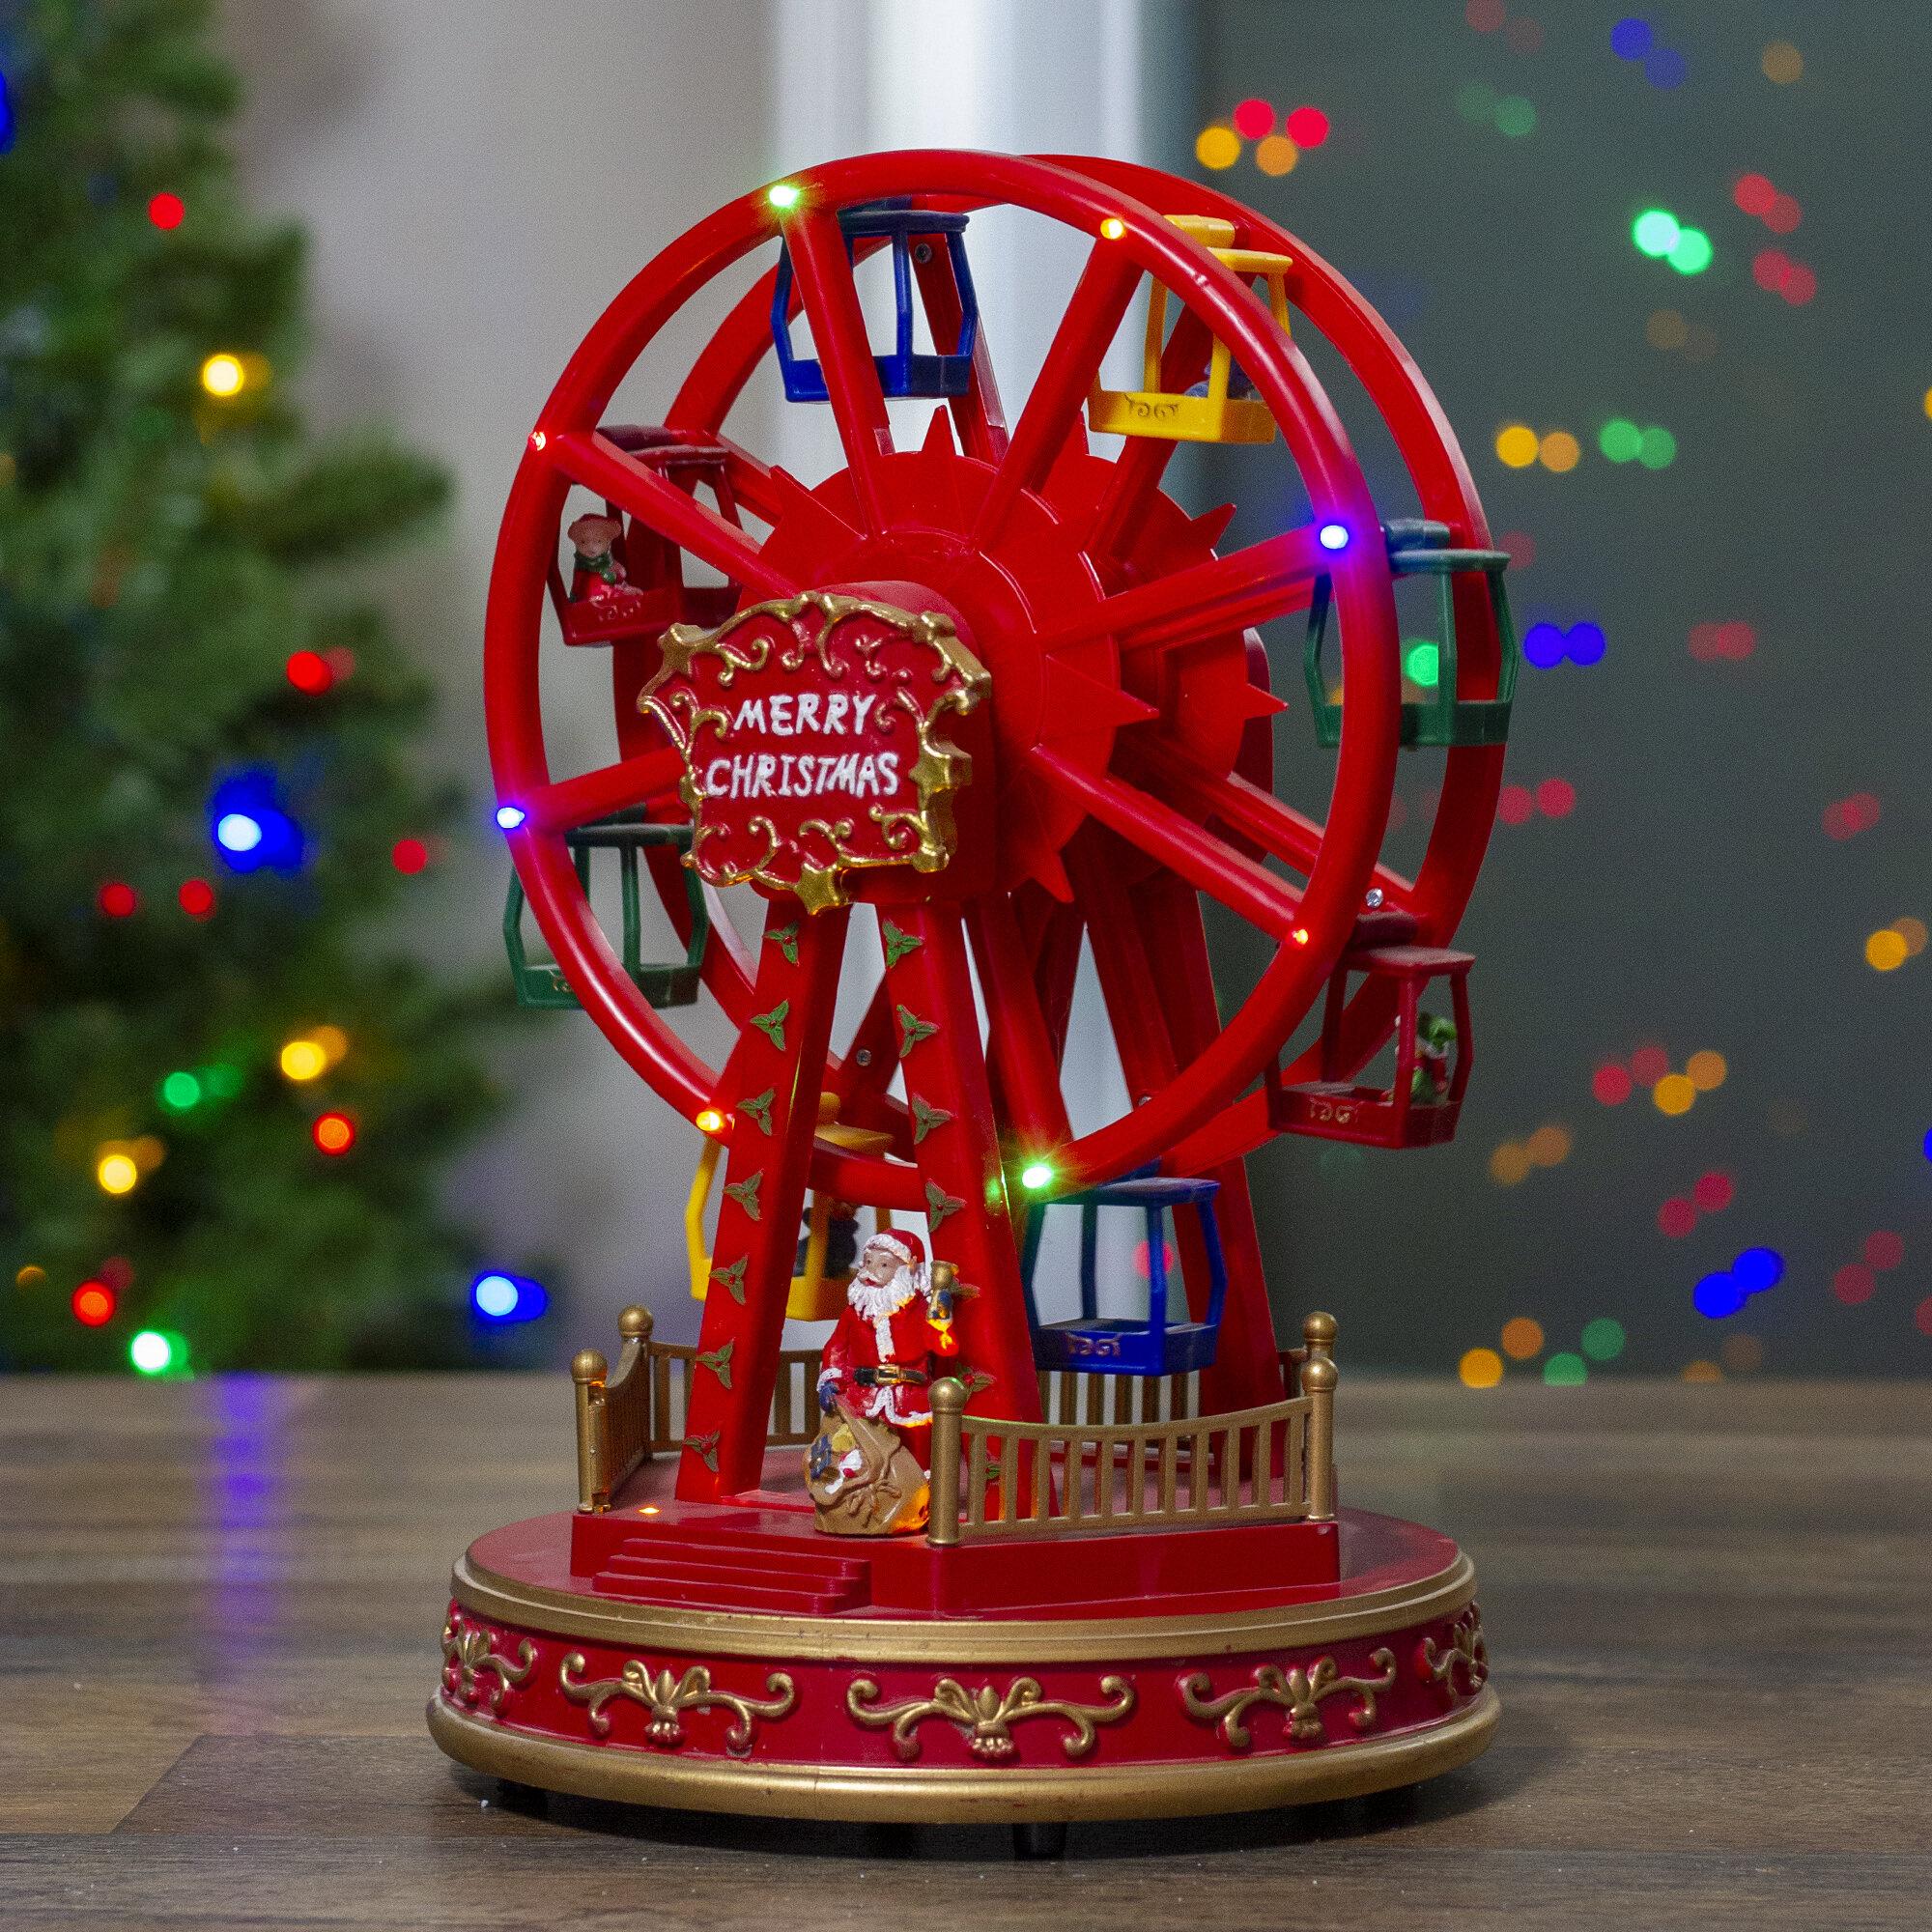 Rotating Ferris Wheel Decorative Accent